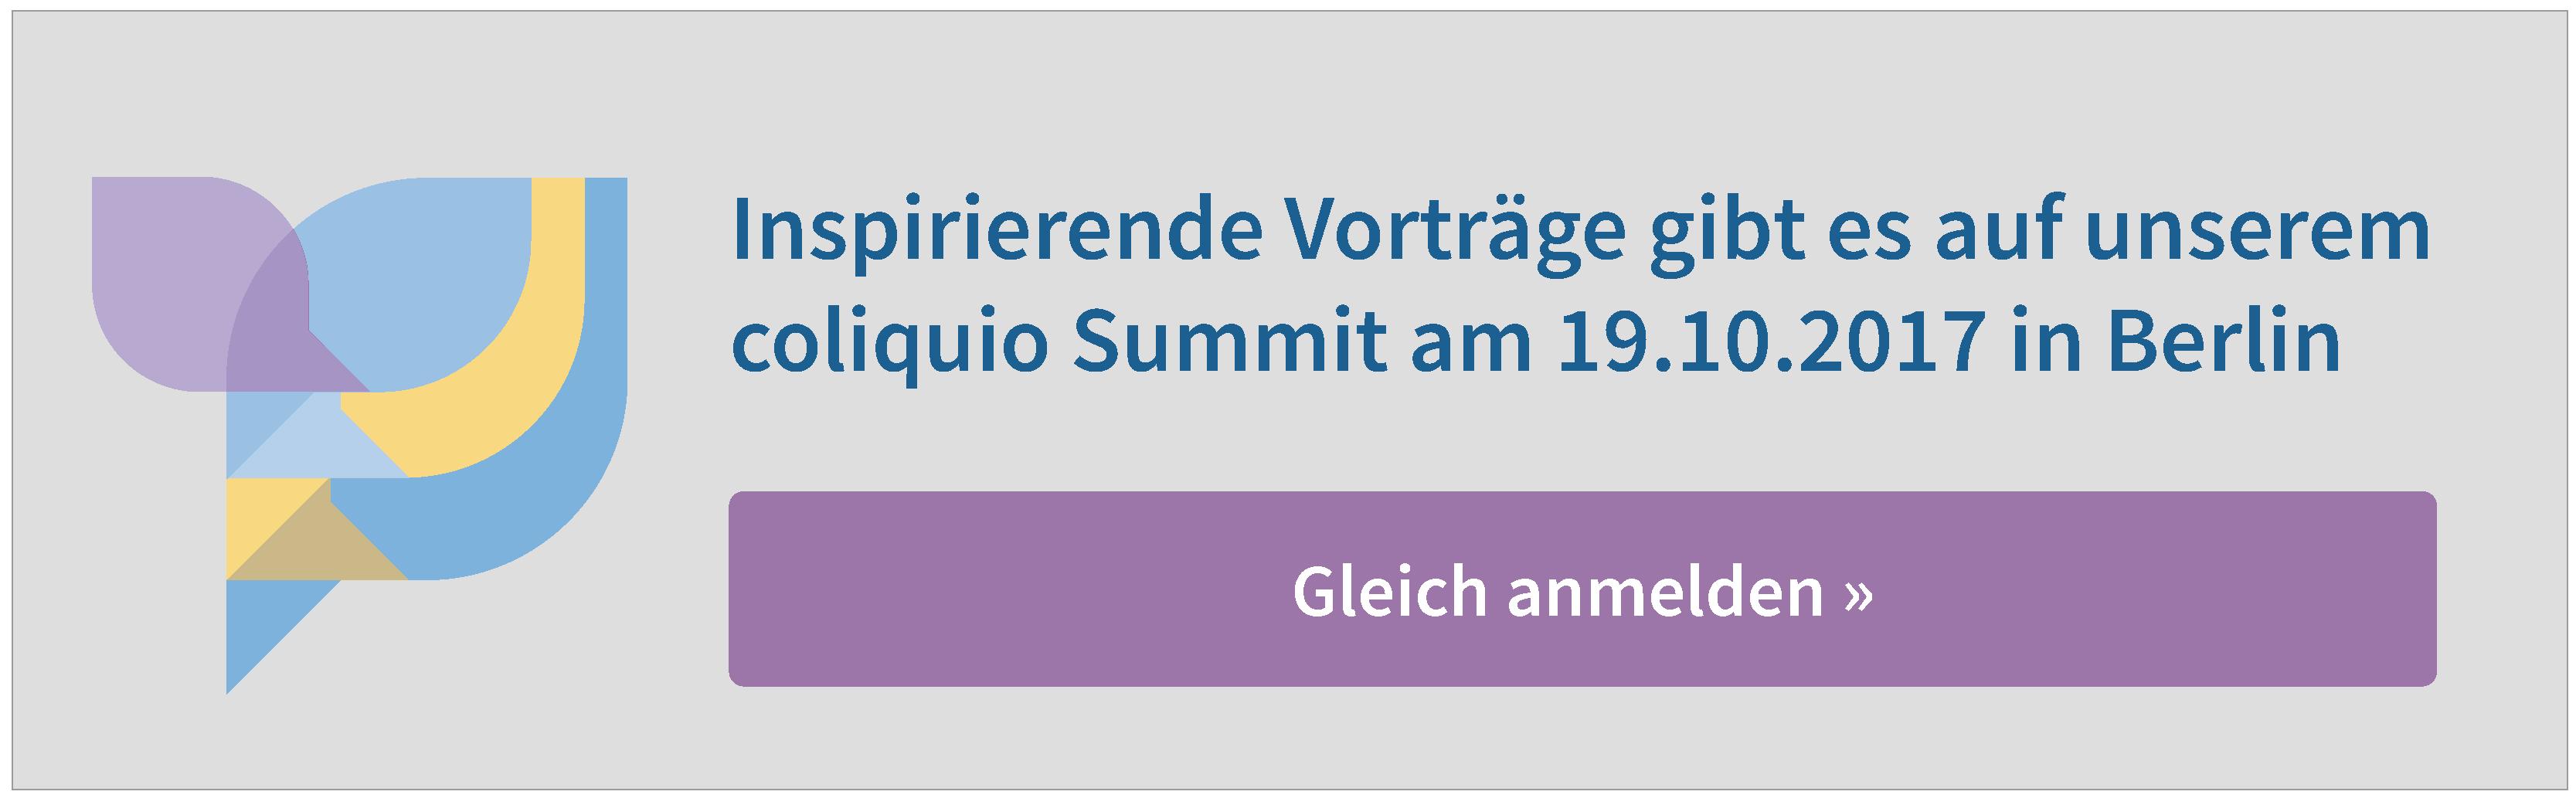 coliquio Summit Berlin